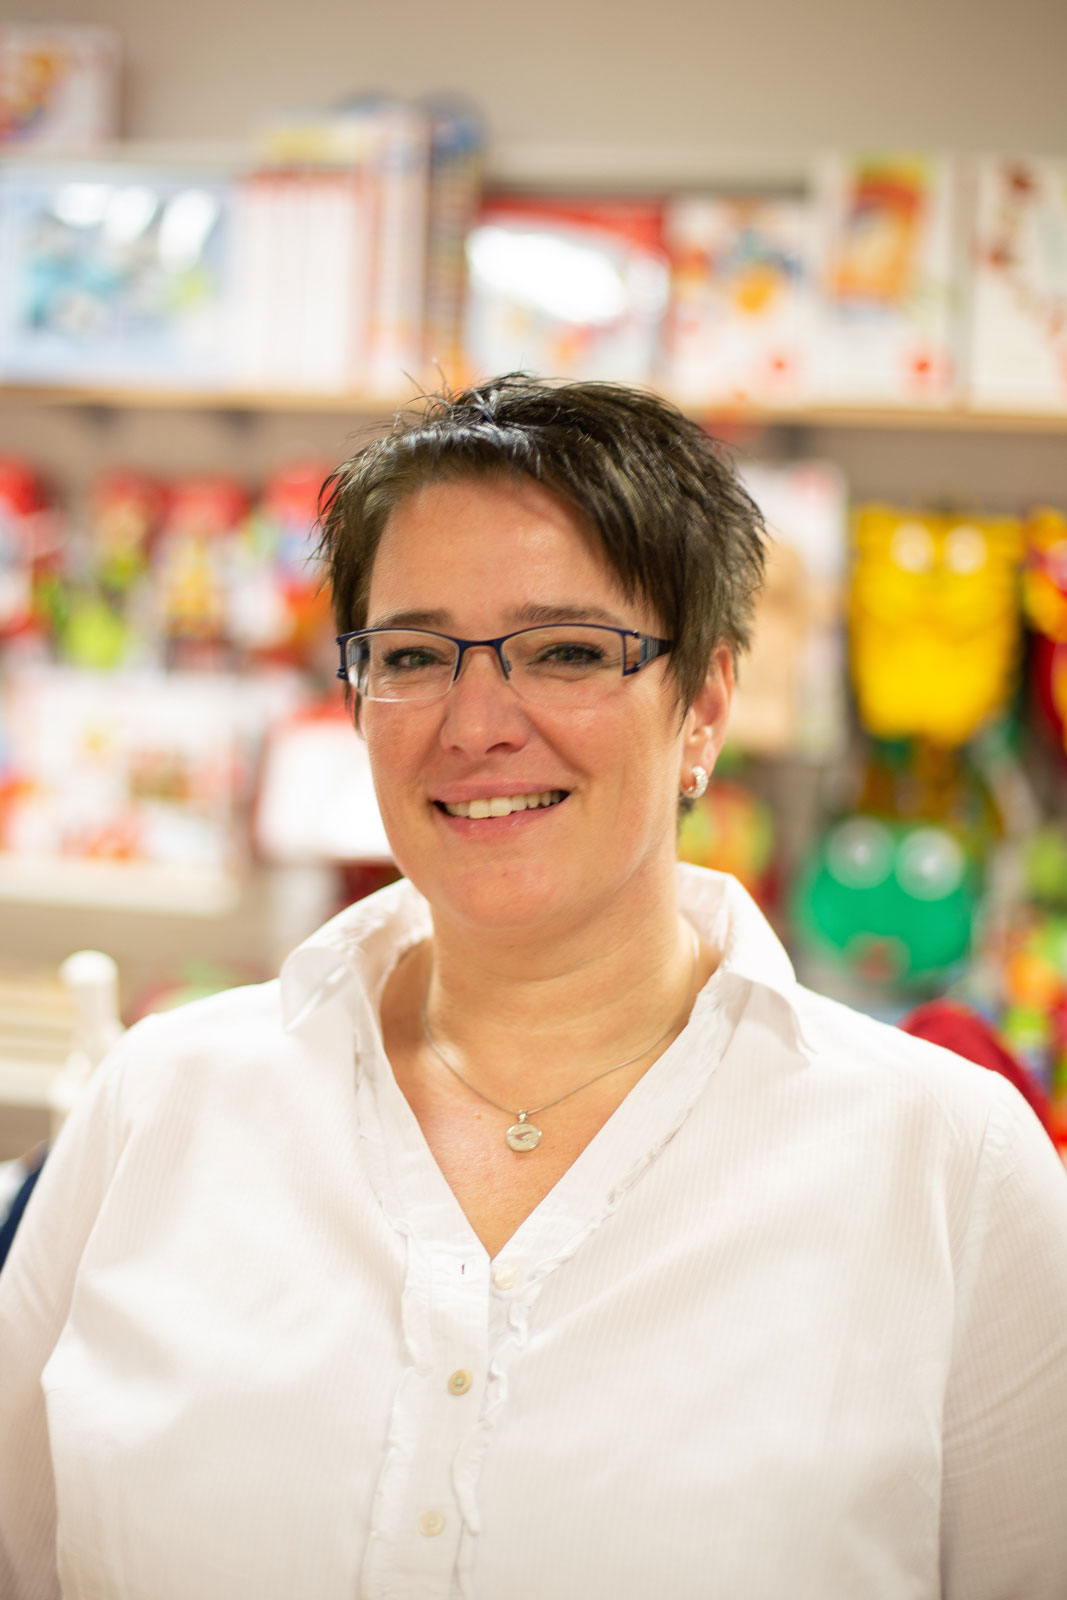 Judith Pennemann